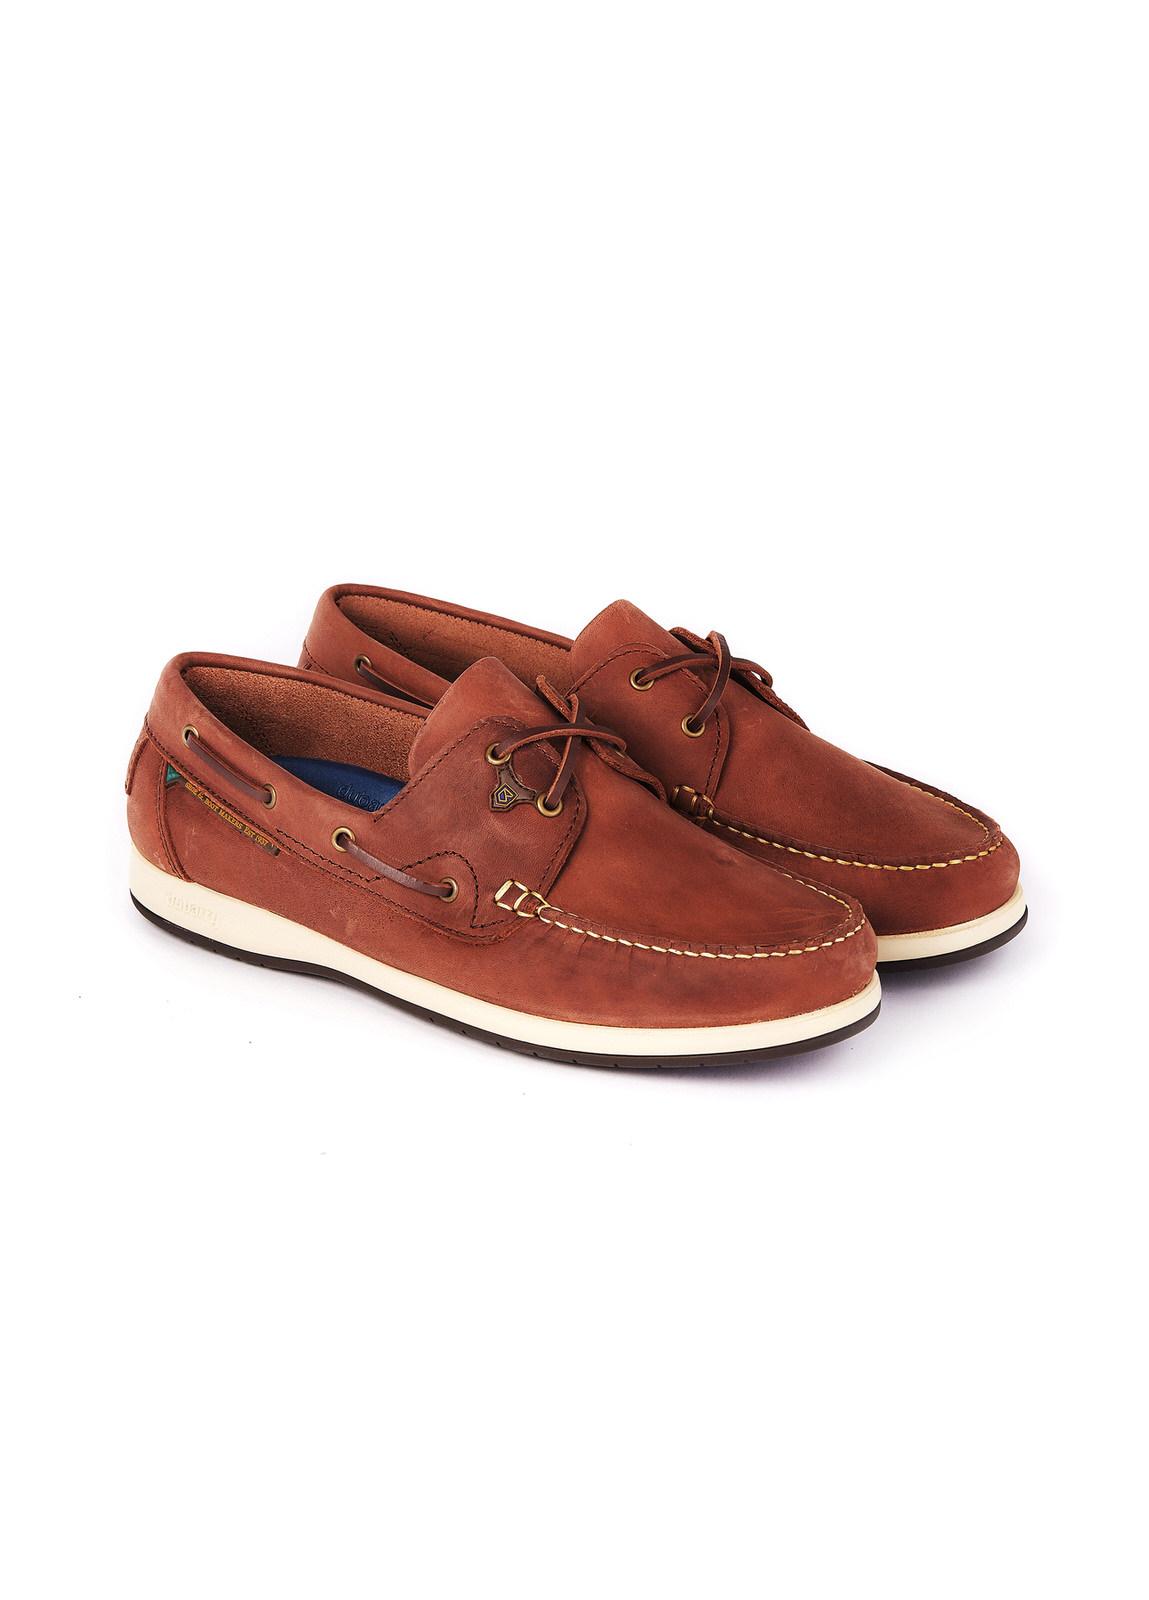 Sailmaker_X_LT_Deck_Shoe_Chestnut_Image_1